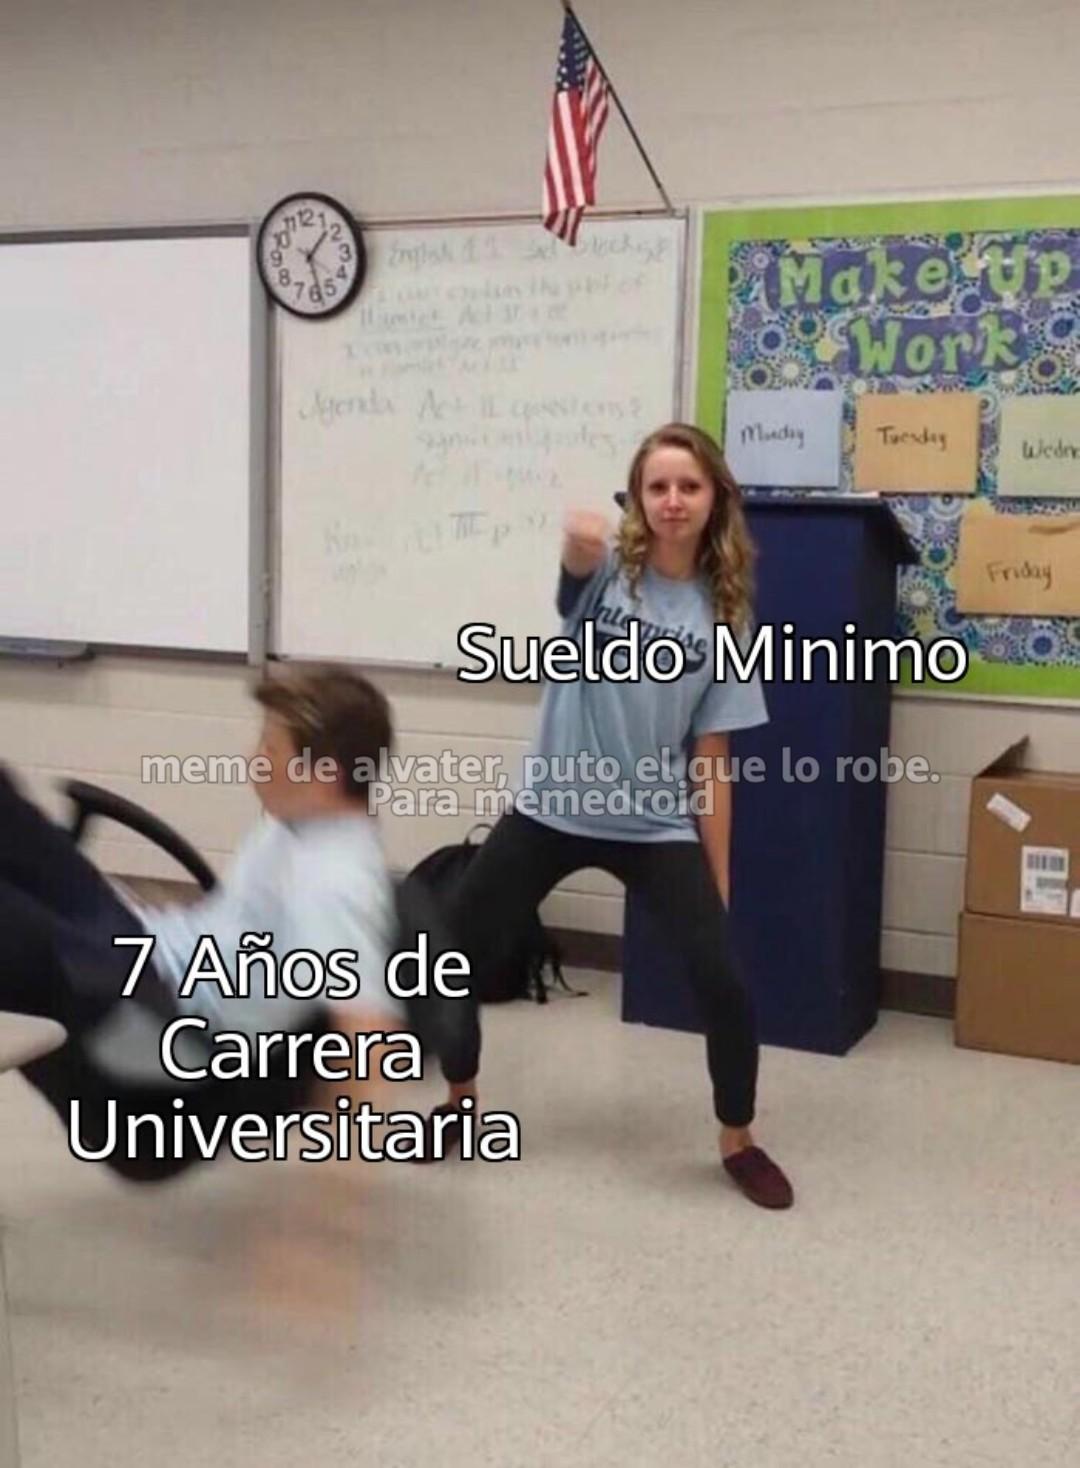 Malos Habitos - meme